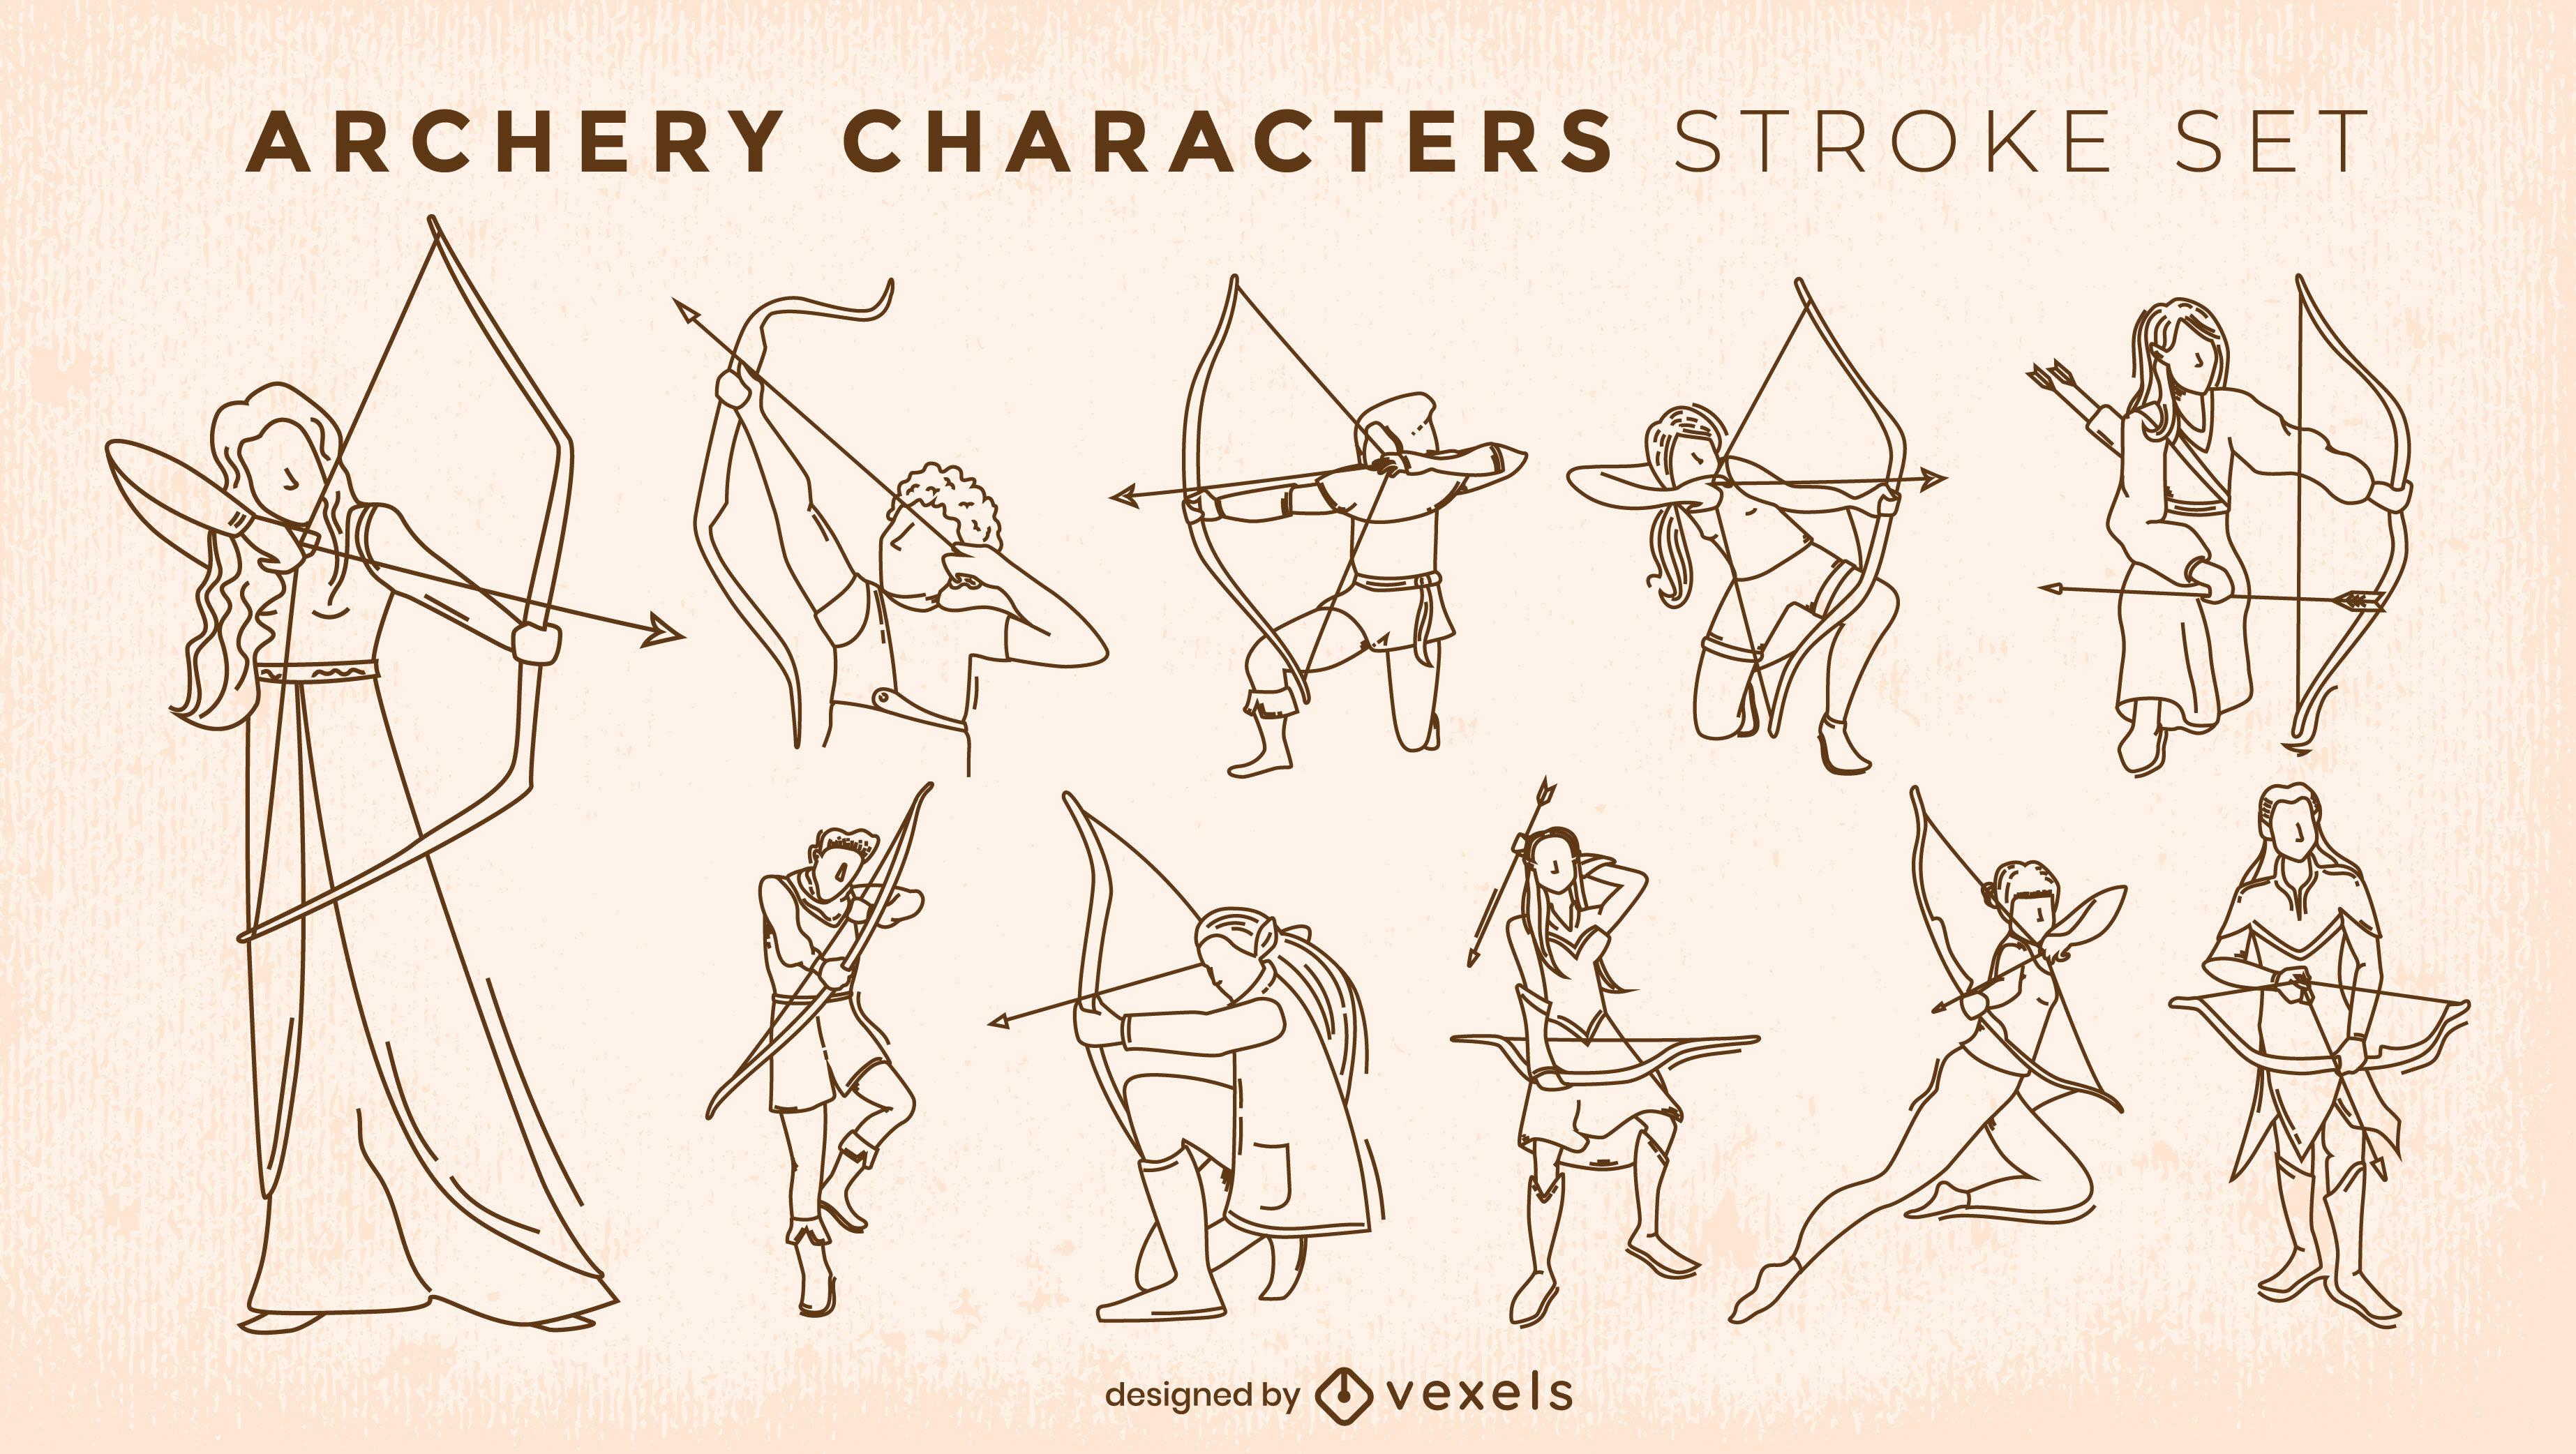 Archery sport medieval character stroke set